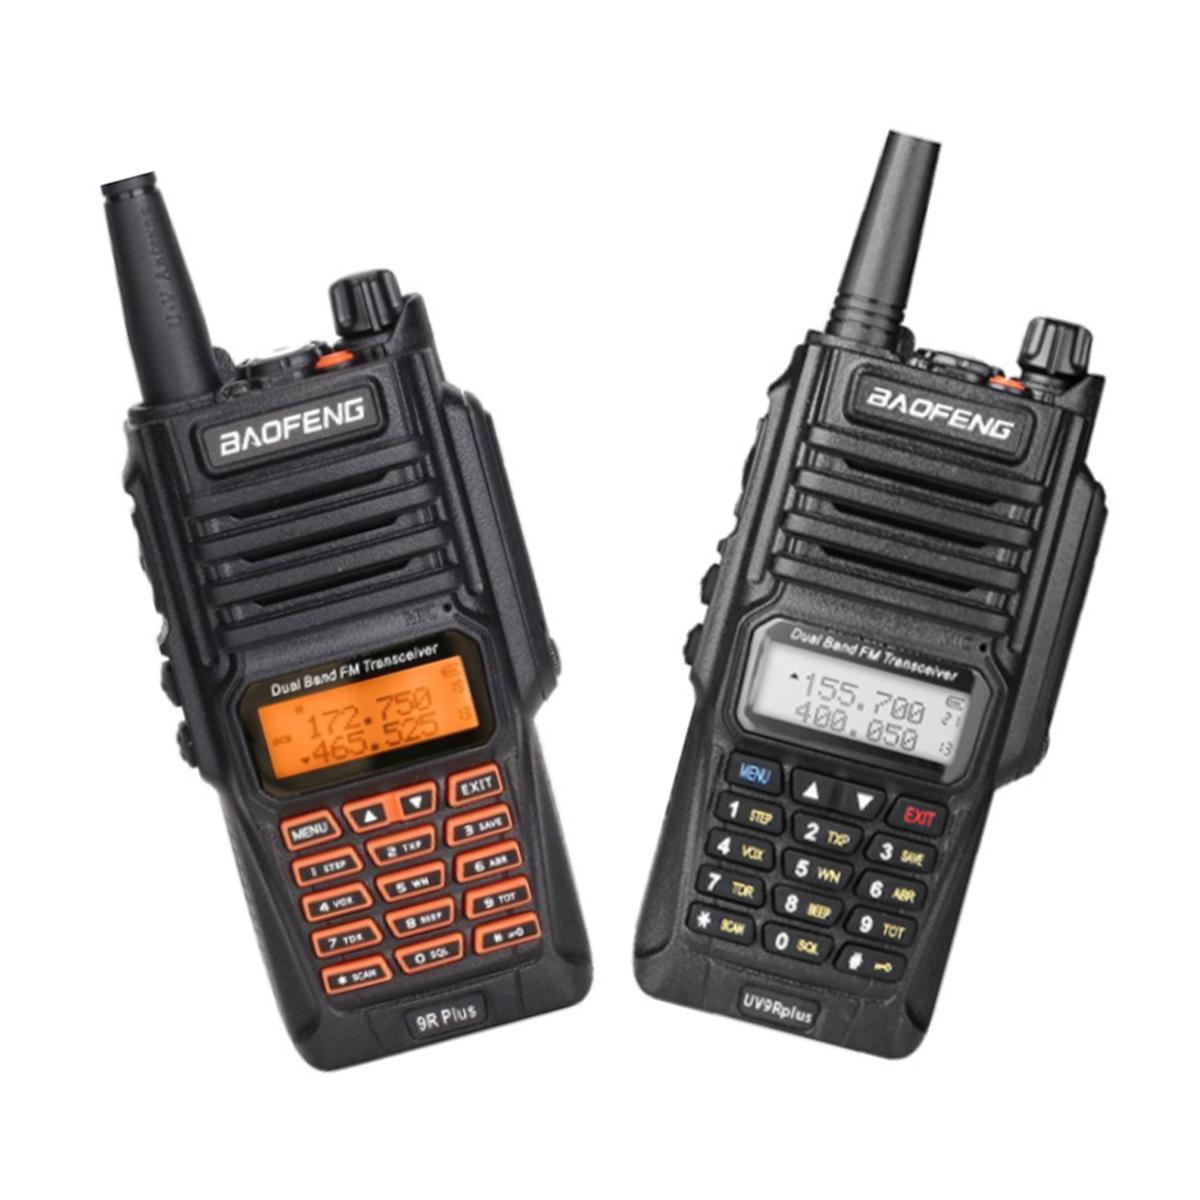 EGI US$41.19 BAOFENG UV-9R Pro 15W 8800 mAh FM Transceiver Waterproof Dual Band Handheld Radio Walkie Talkie